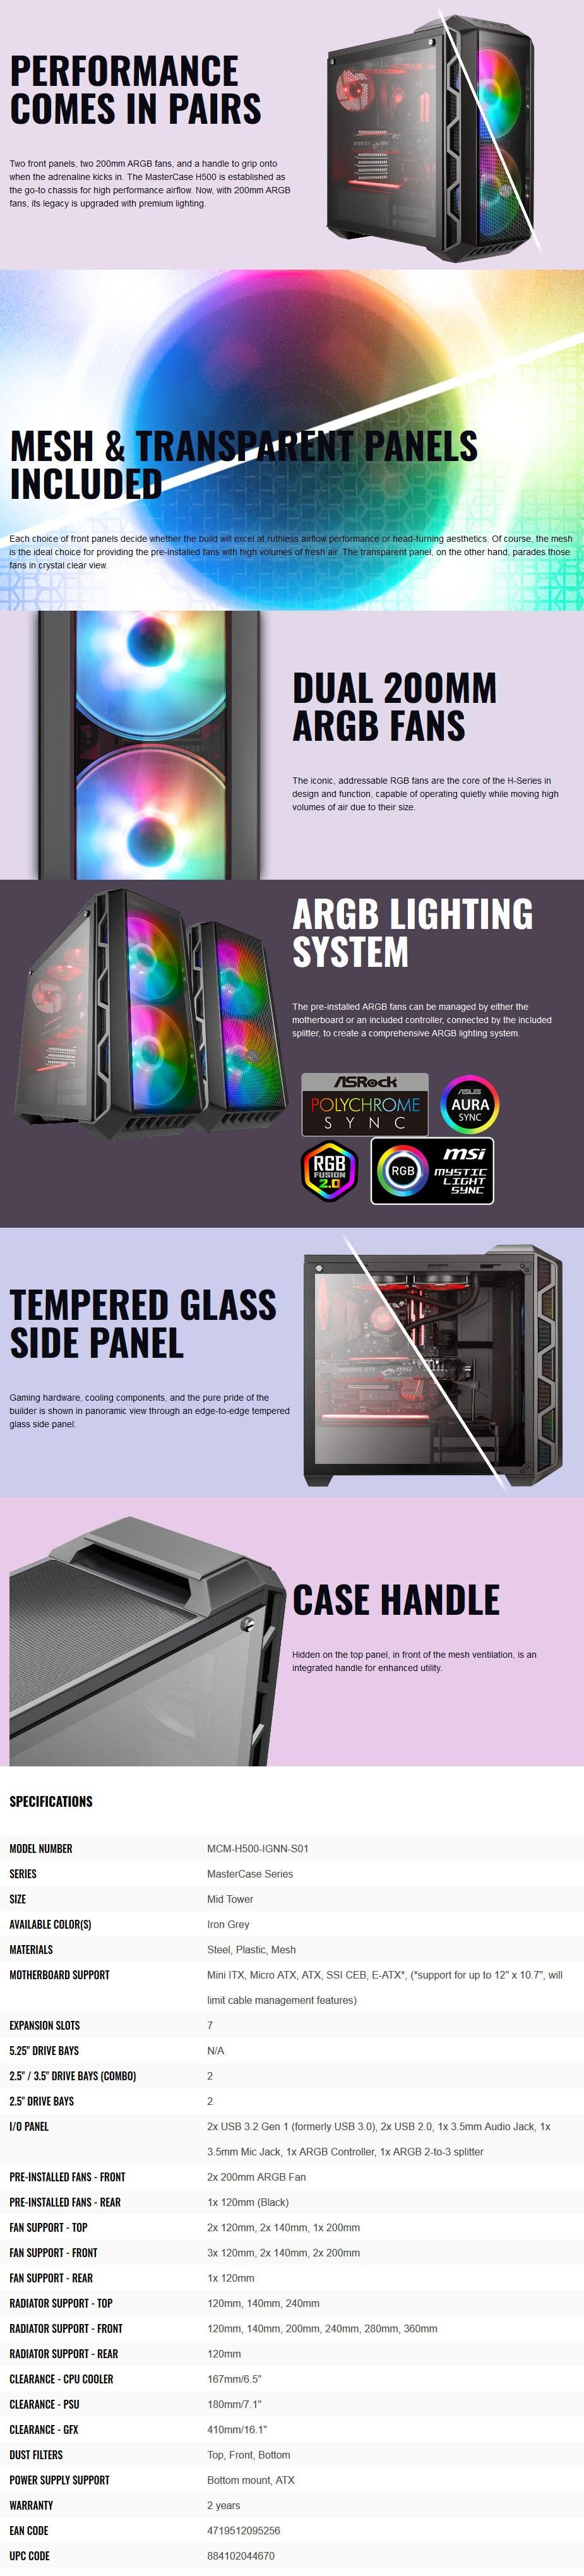 cooler-master-mastercase-h500-argb-tempered-glass-mesh-atx-midtower-case-ac32325-5.jpg